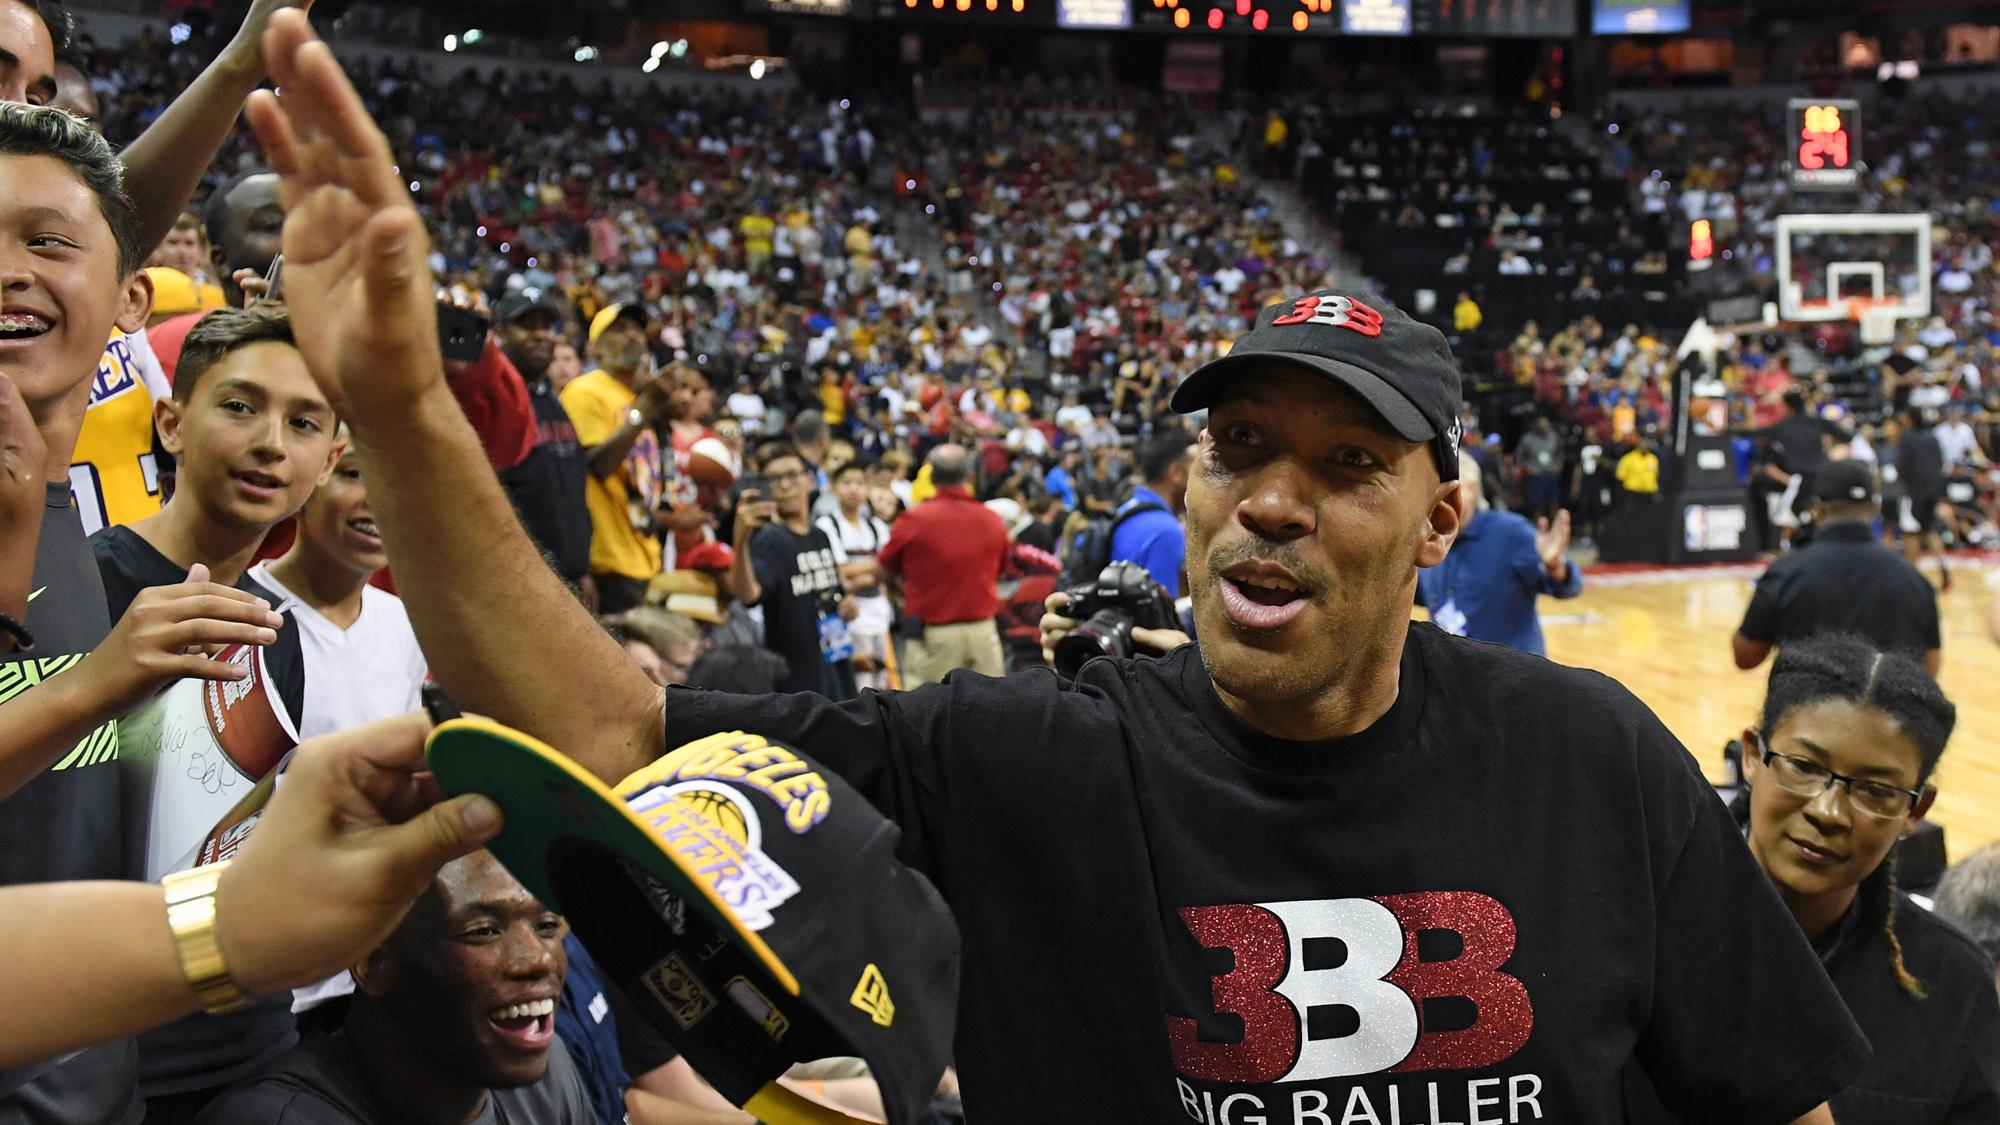 2017 Las Vegas Summer League – Los Angeles Clippers v Los Angeles Lakers